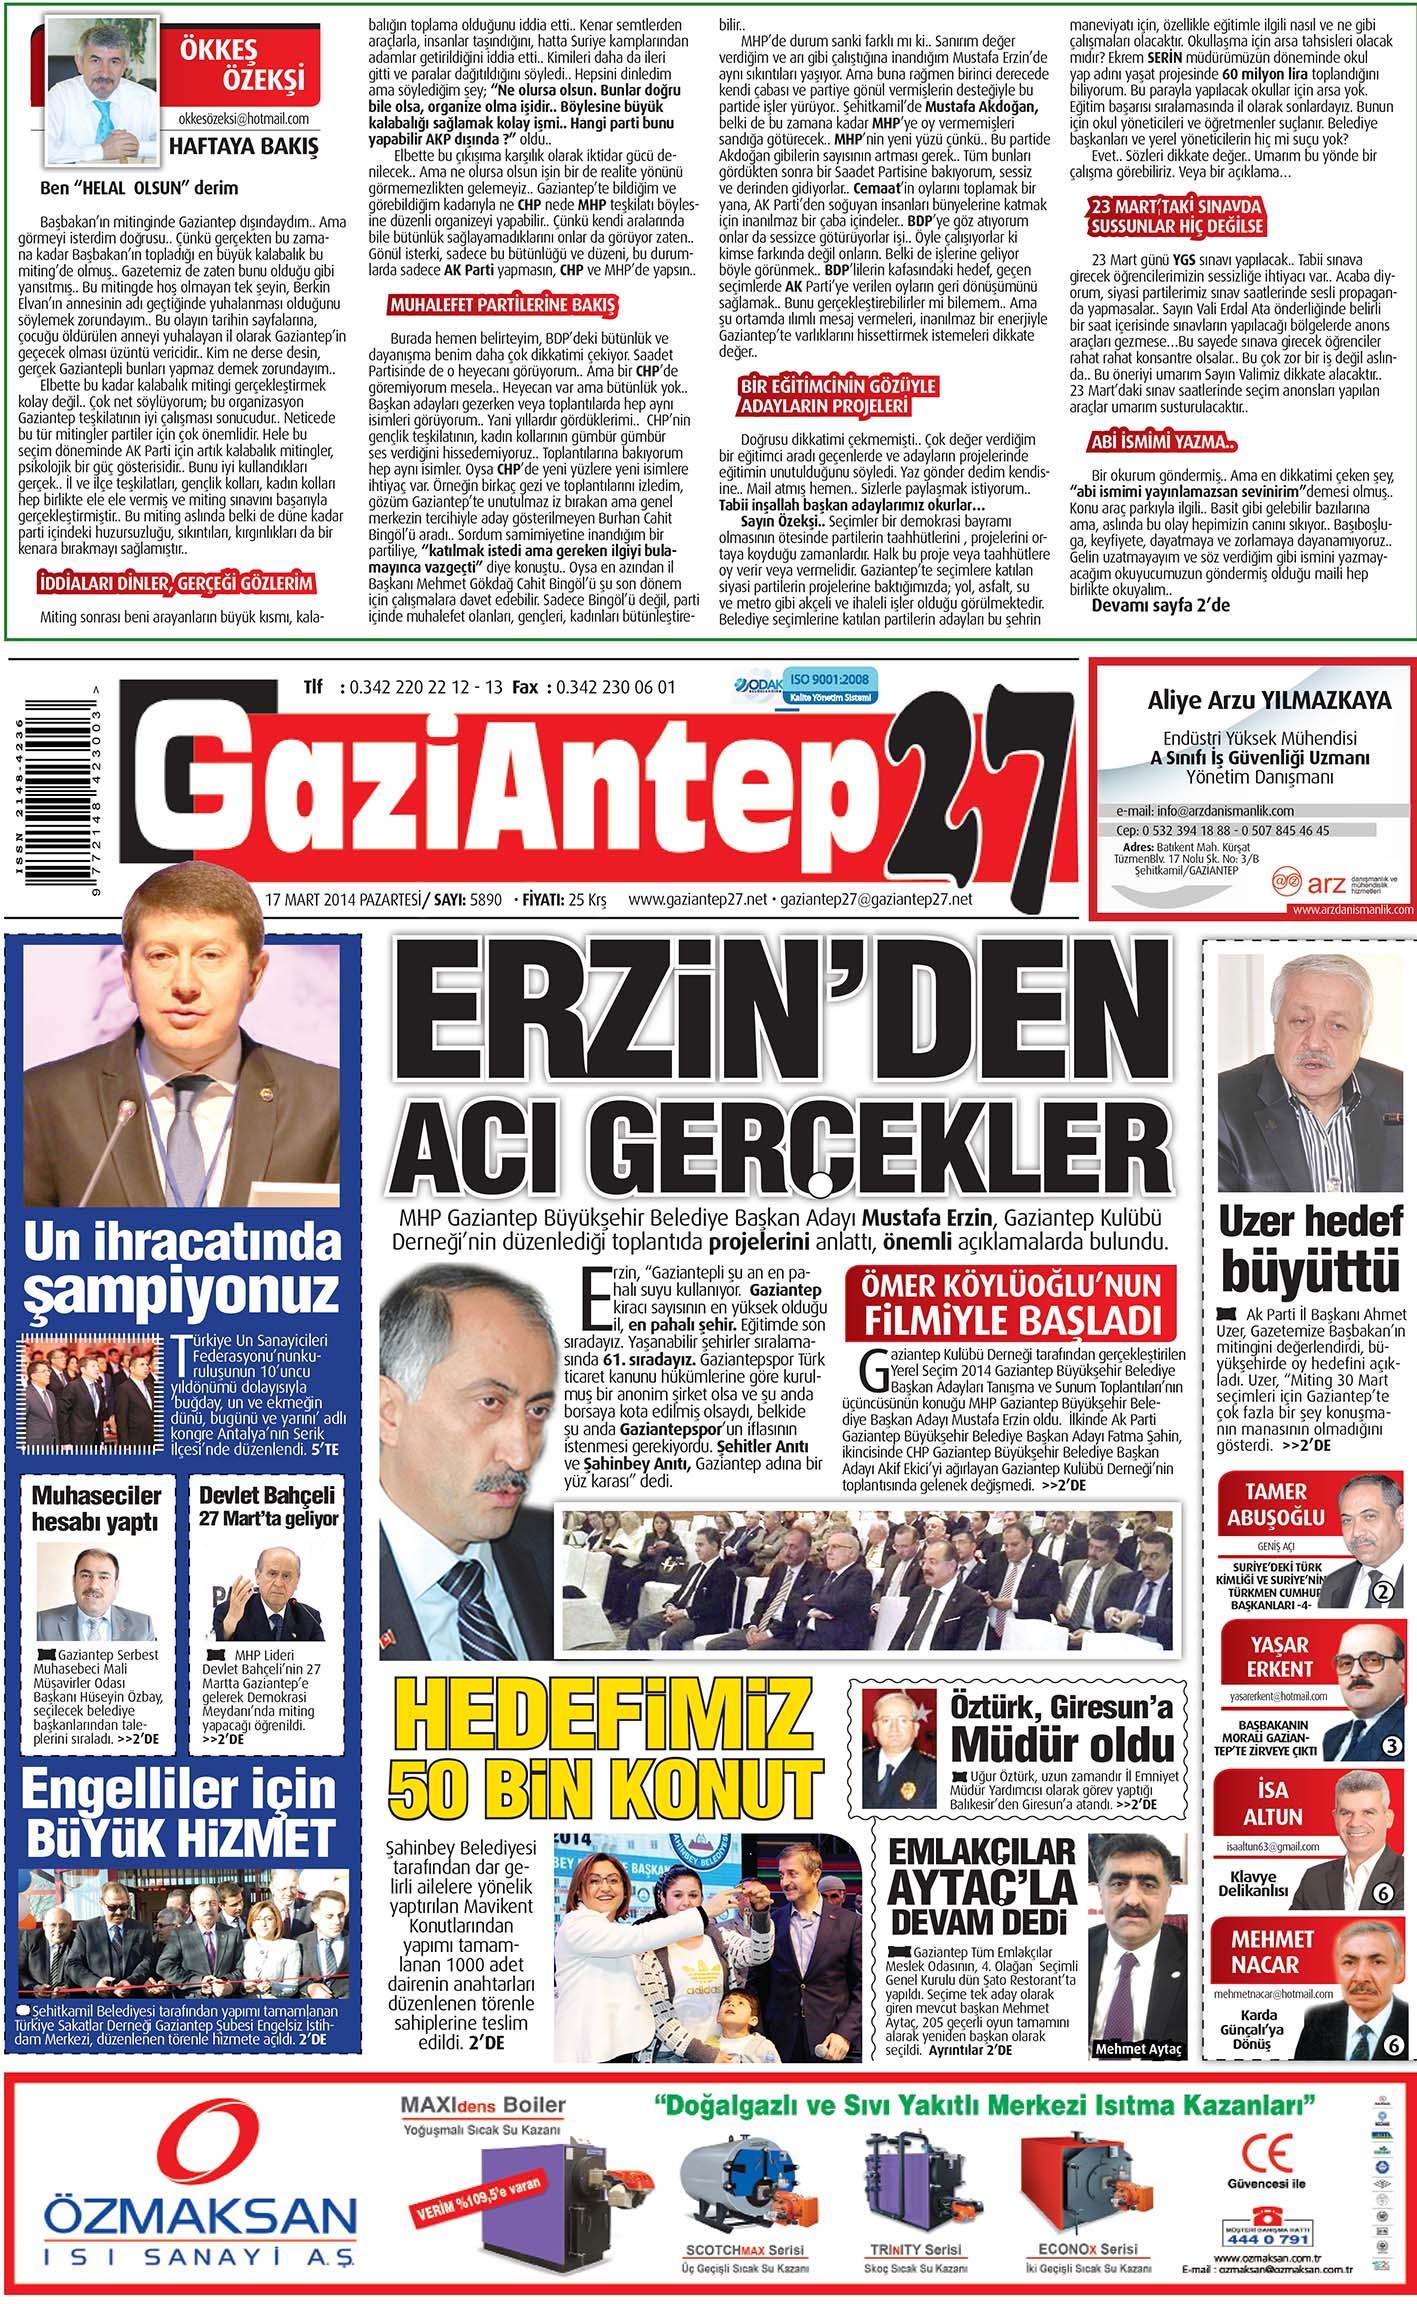 17 Mart 2014 sayfalar 1